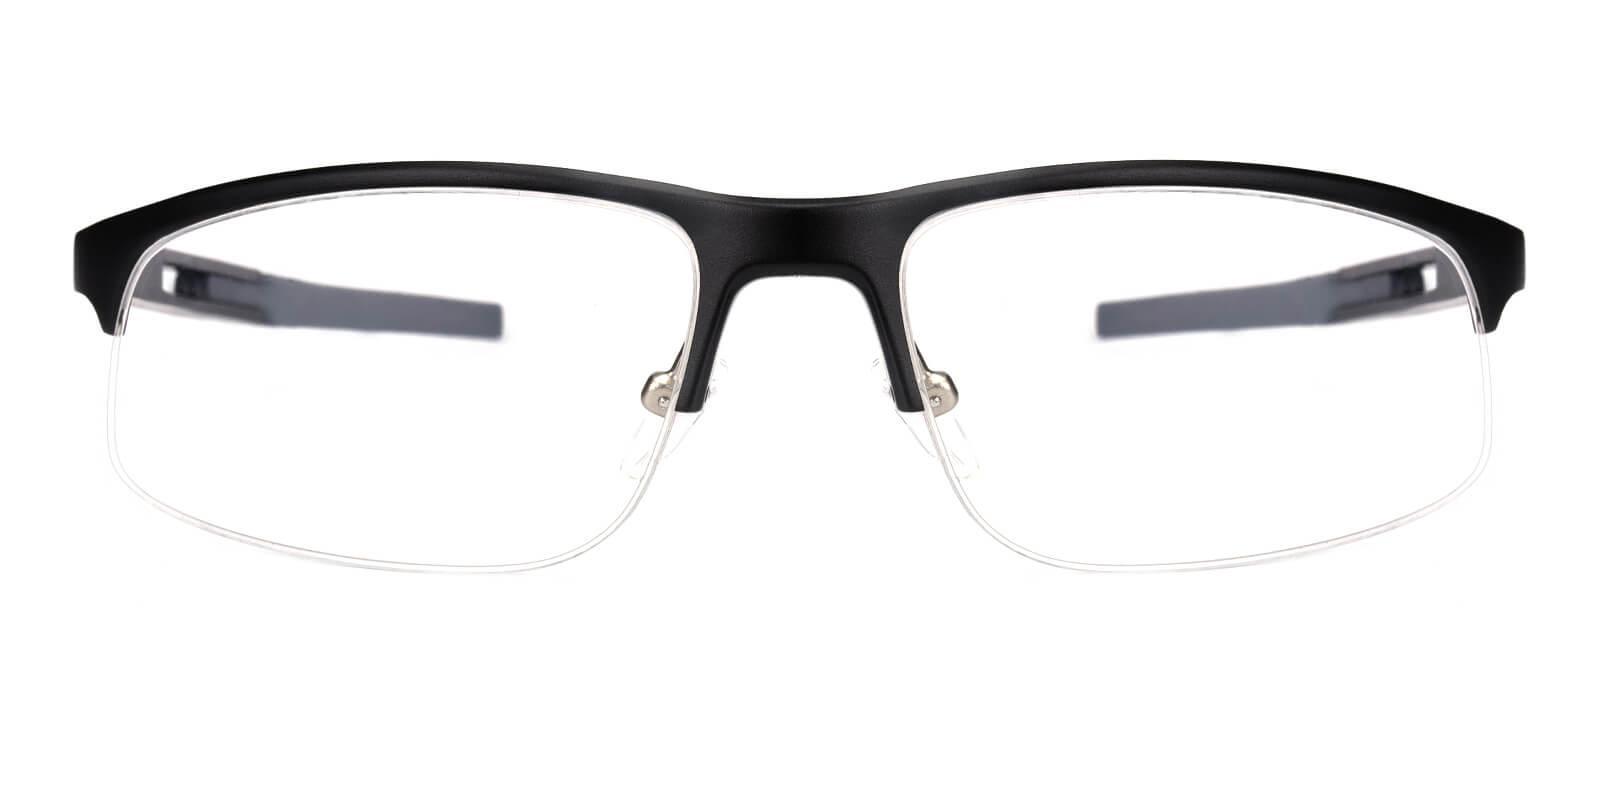 Graysun-Black-Rectangle-Metal-SportsGlasses-additional2